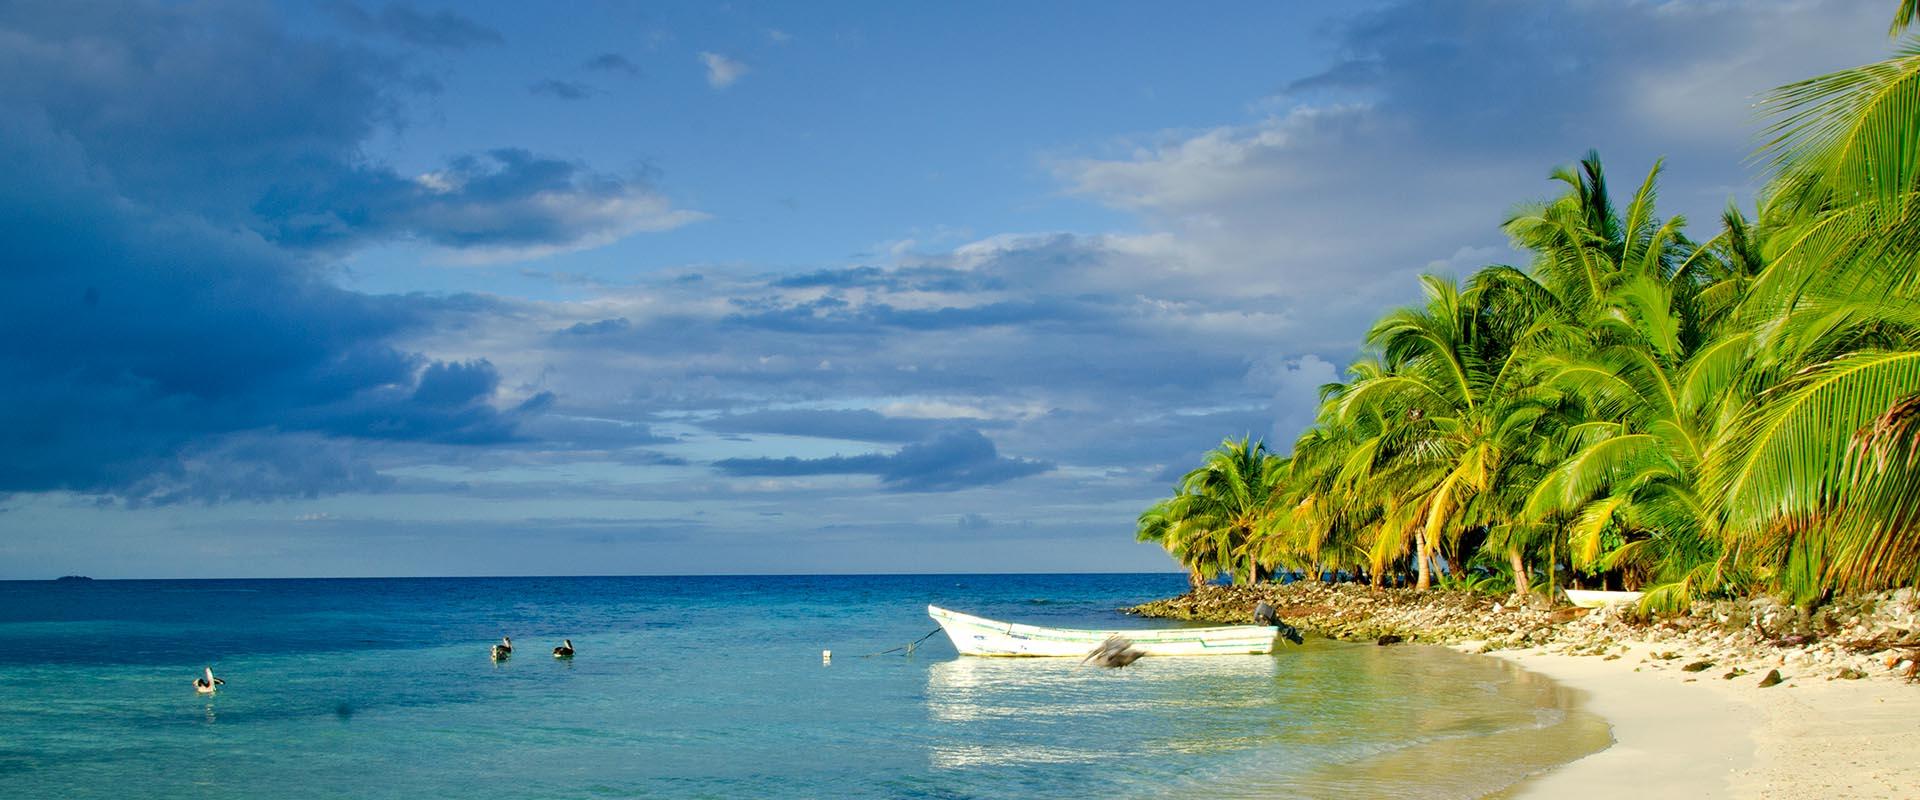 Belize Public Holidays Publicholidays Bz